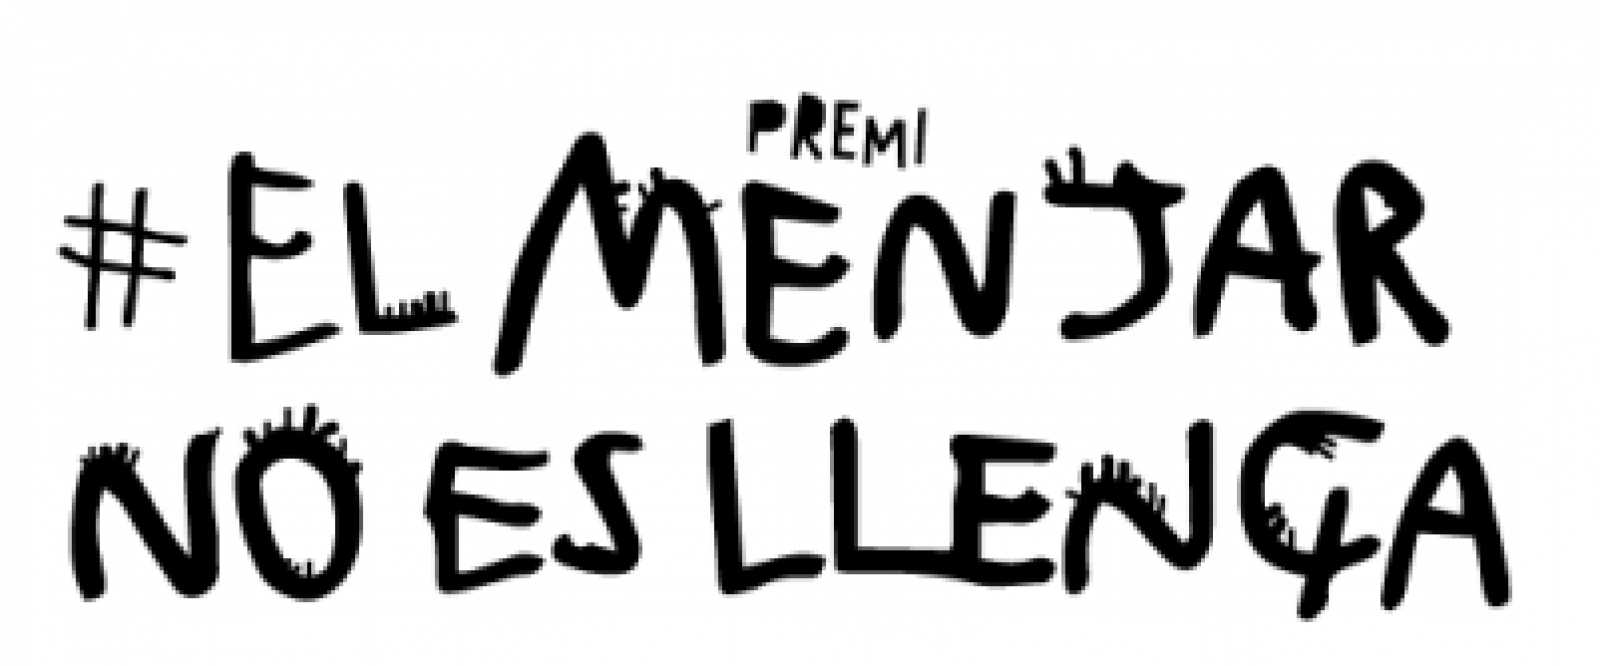 El logotip del concurs